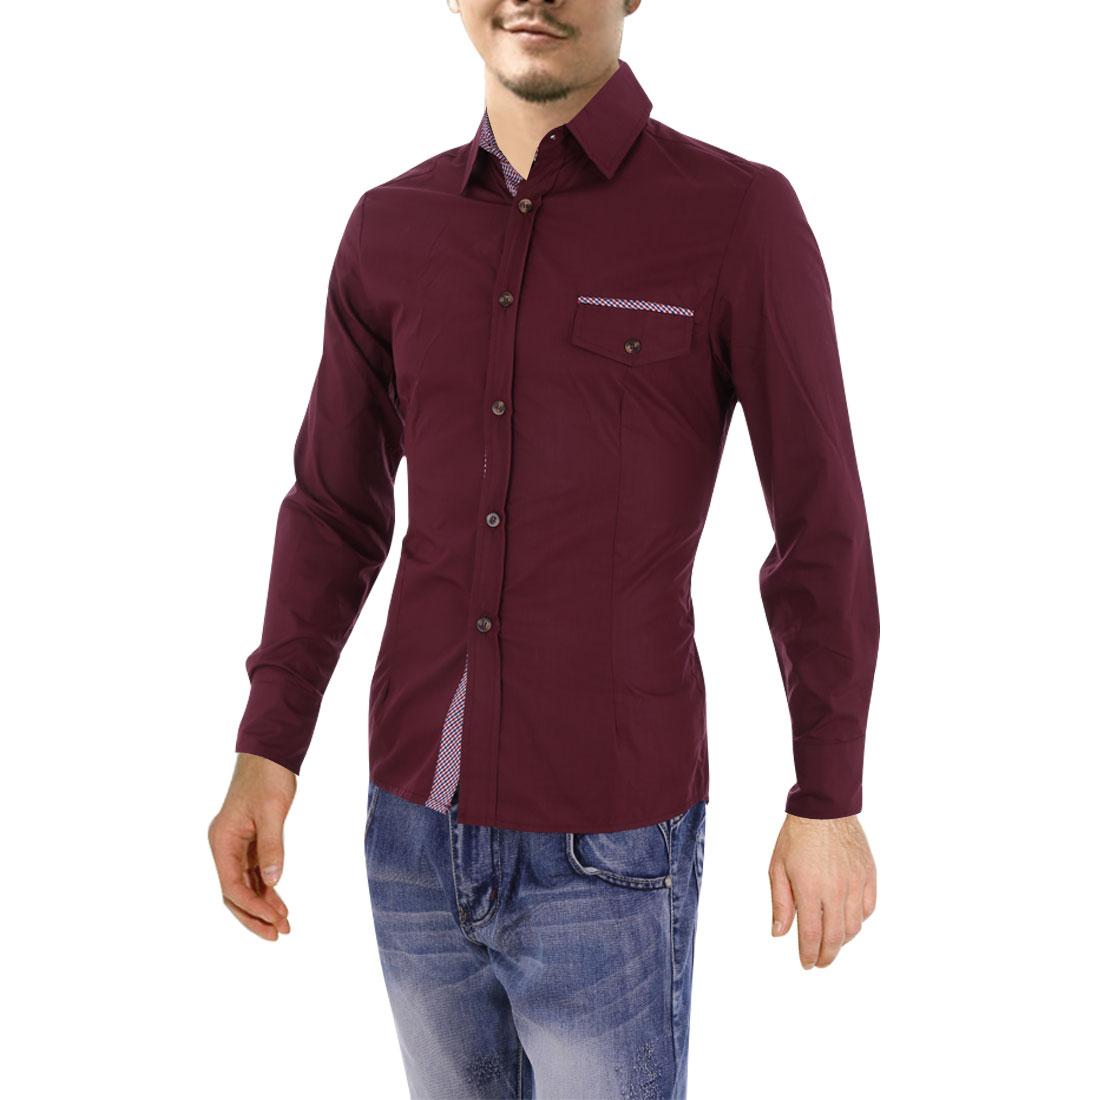 Mens Point Collar Long Sleeve Plaids Detail Burgundy Casual Shirt M